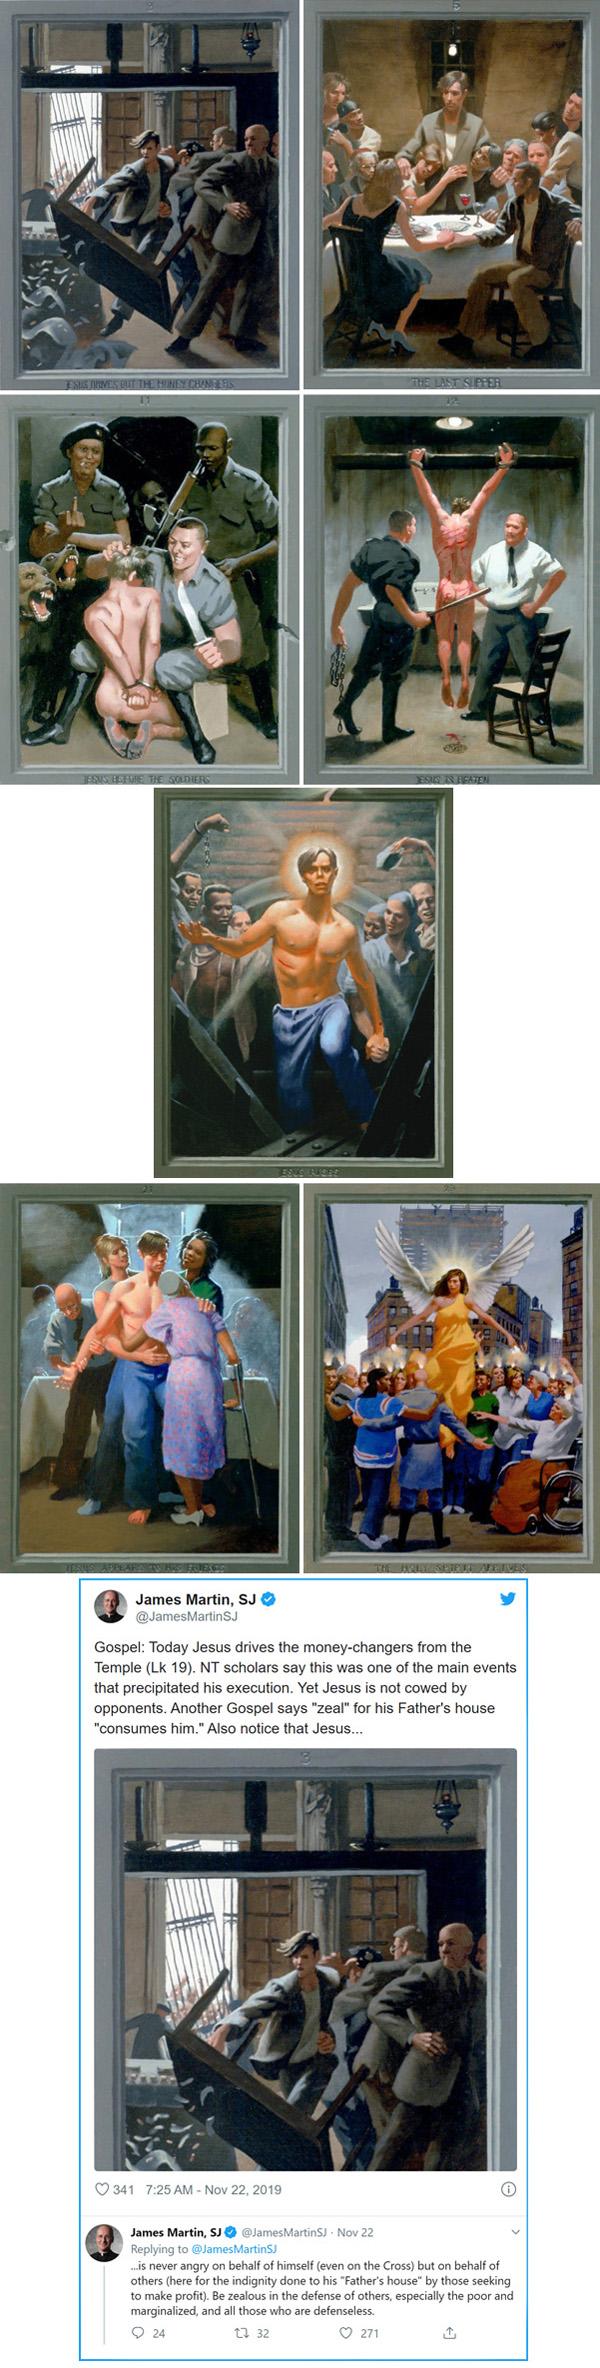 El p. James Martin promueve gay Jesús 2